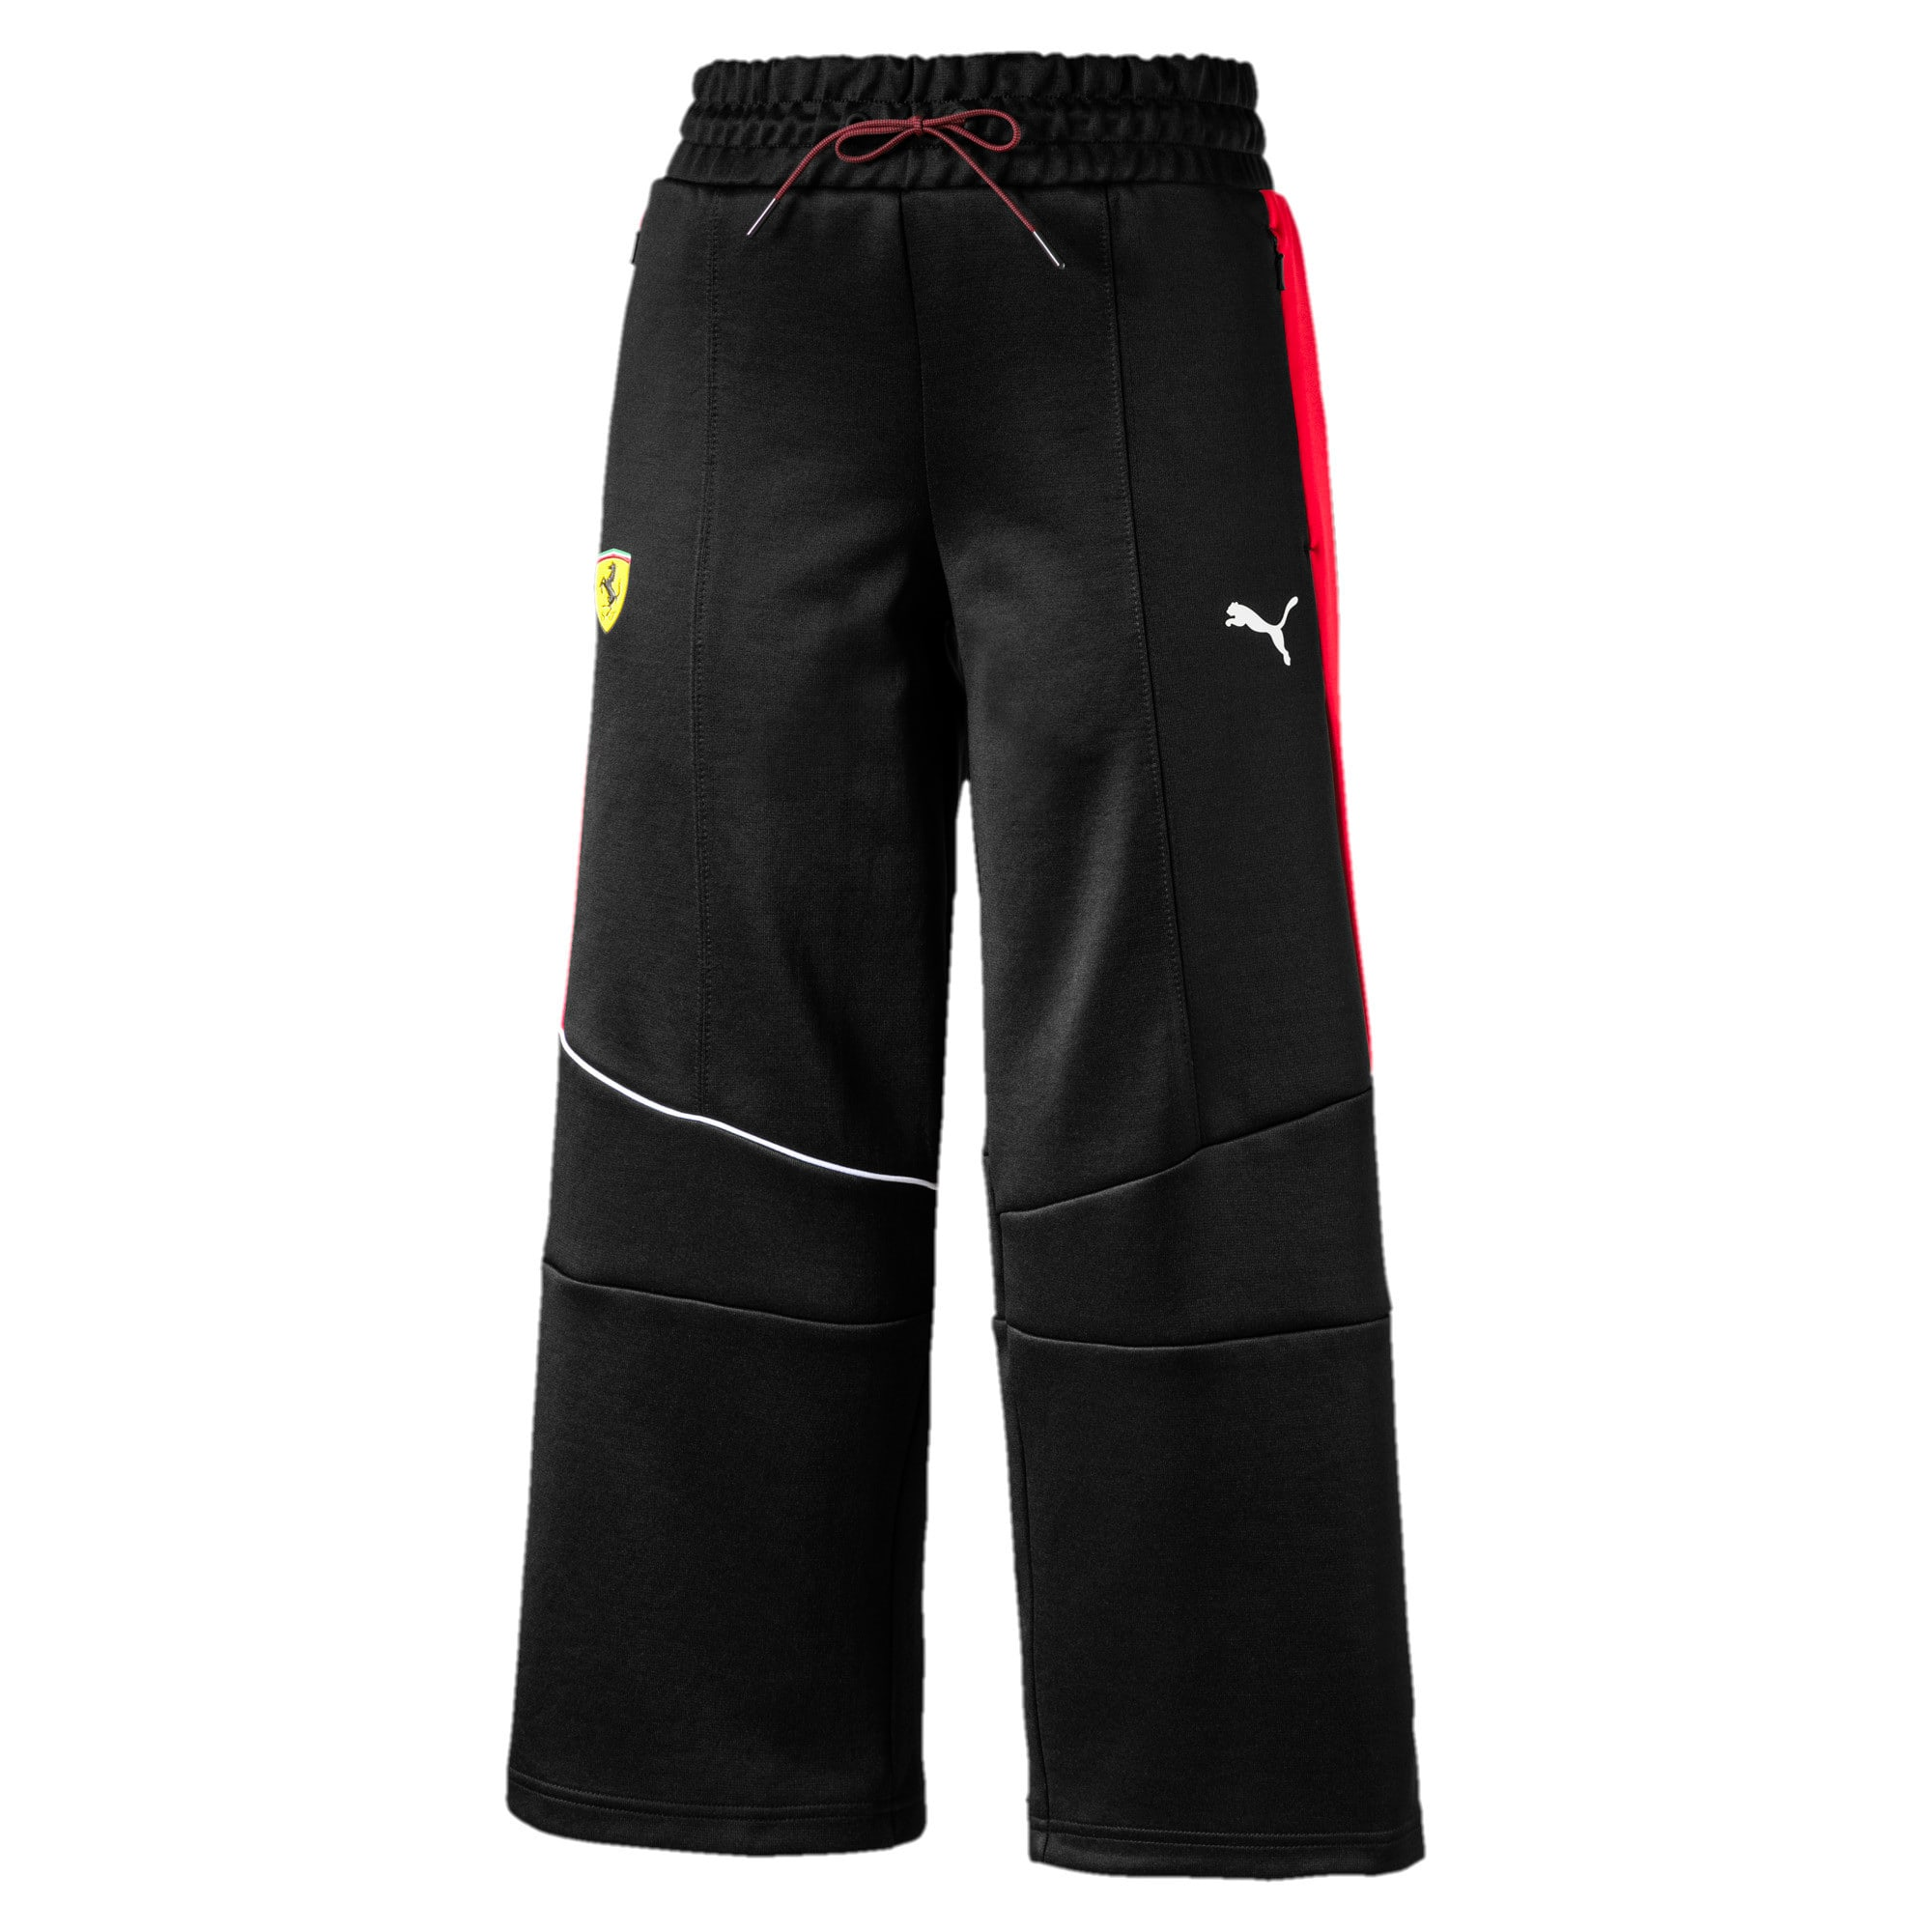 Thumbnail 1 of SF Wmn Track Pants, Puma Black, medium-IND